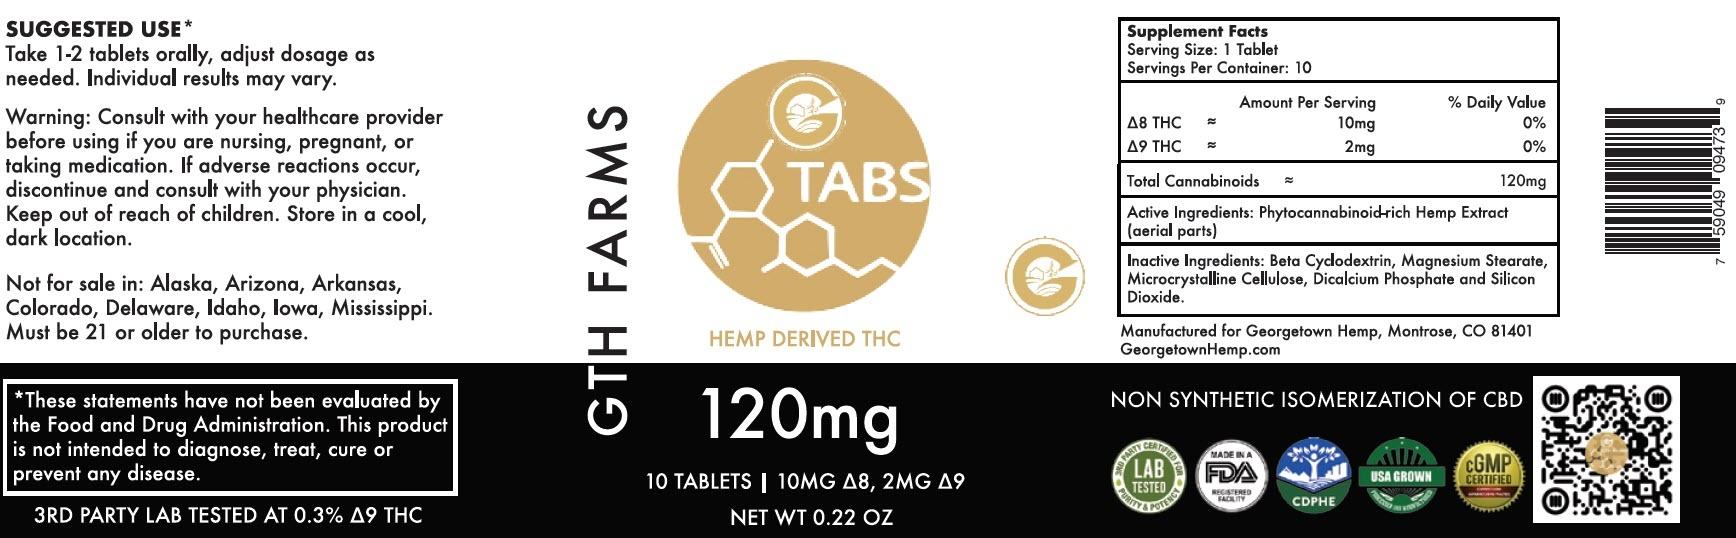 Georgetown Hemp | GTH FARMS | HEMP DERIVED THC TABLETS | 2 OPTIONS |